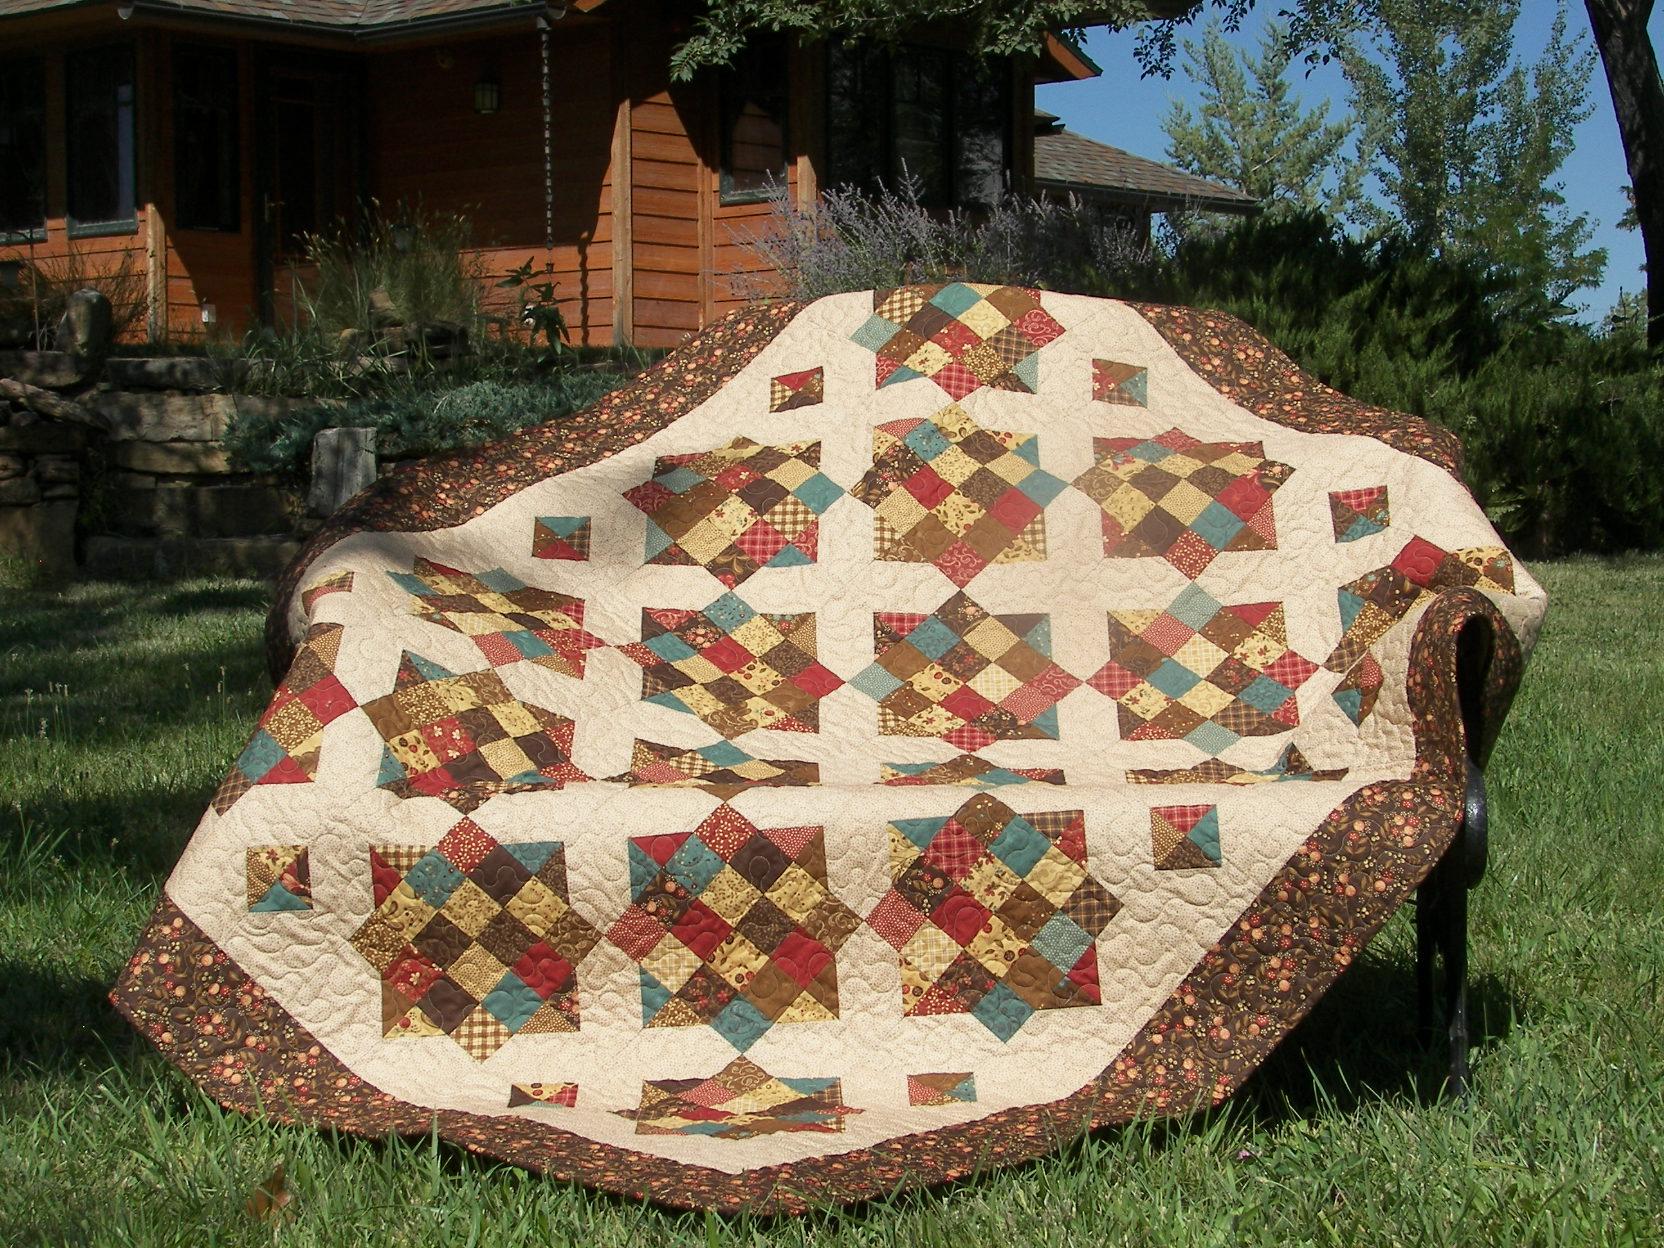 Quilts made from Missouri Star Quilt tutorials : missouri quilt star - Adamdwight.com